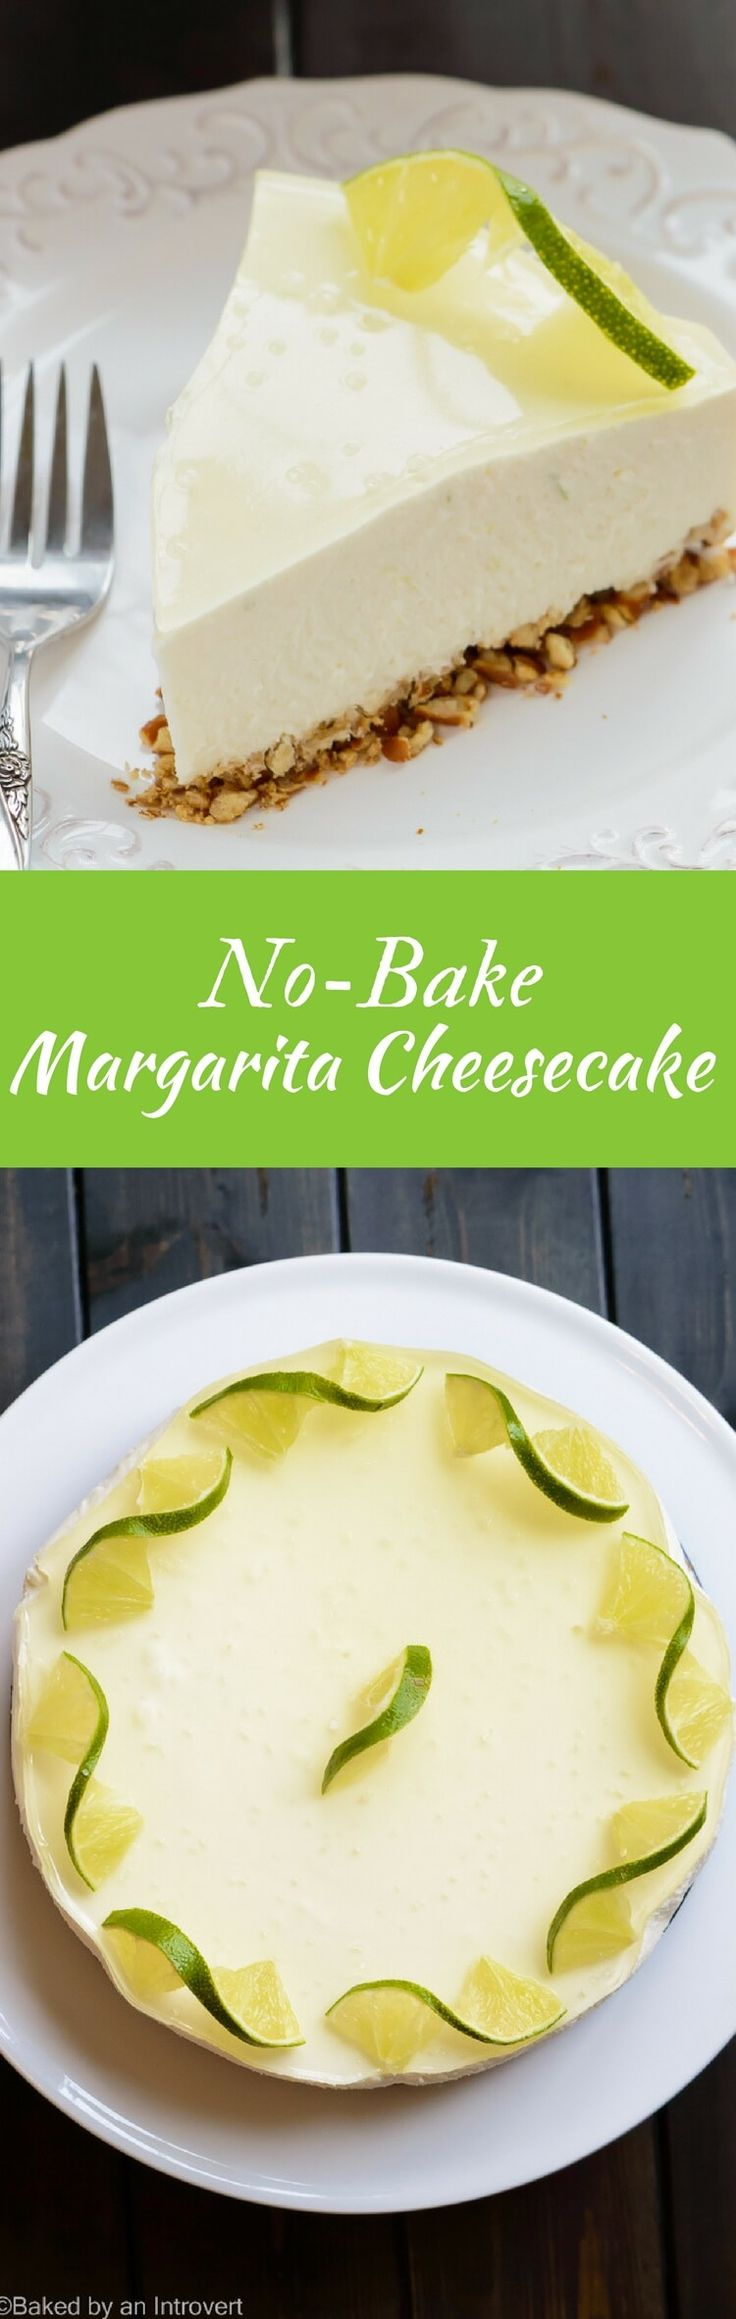 Margarita Cheesecake   No Bake   Dessert   via @introvertbaker